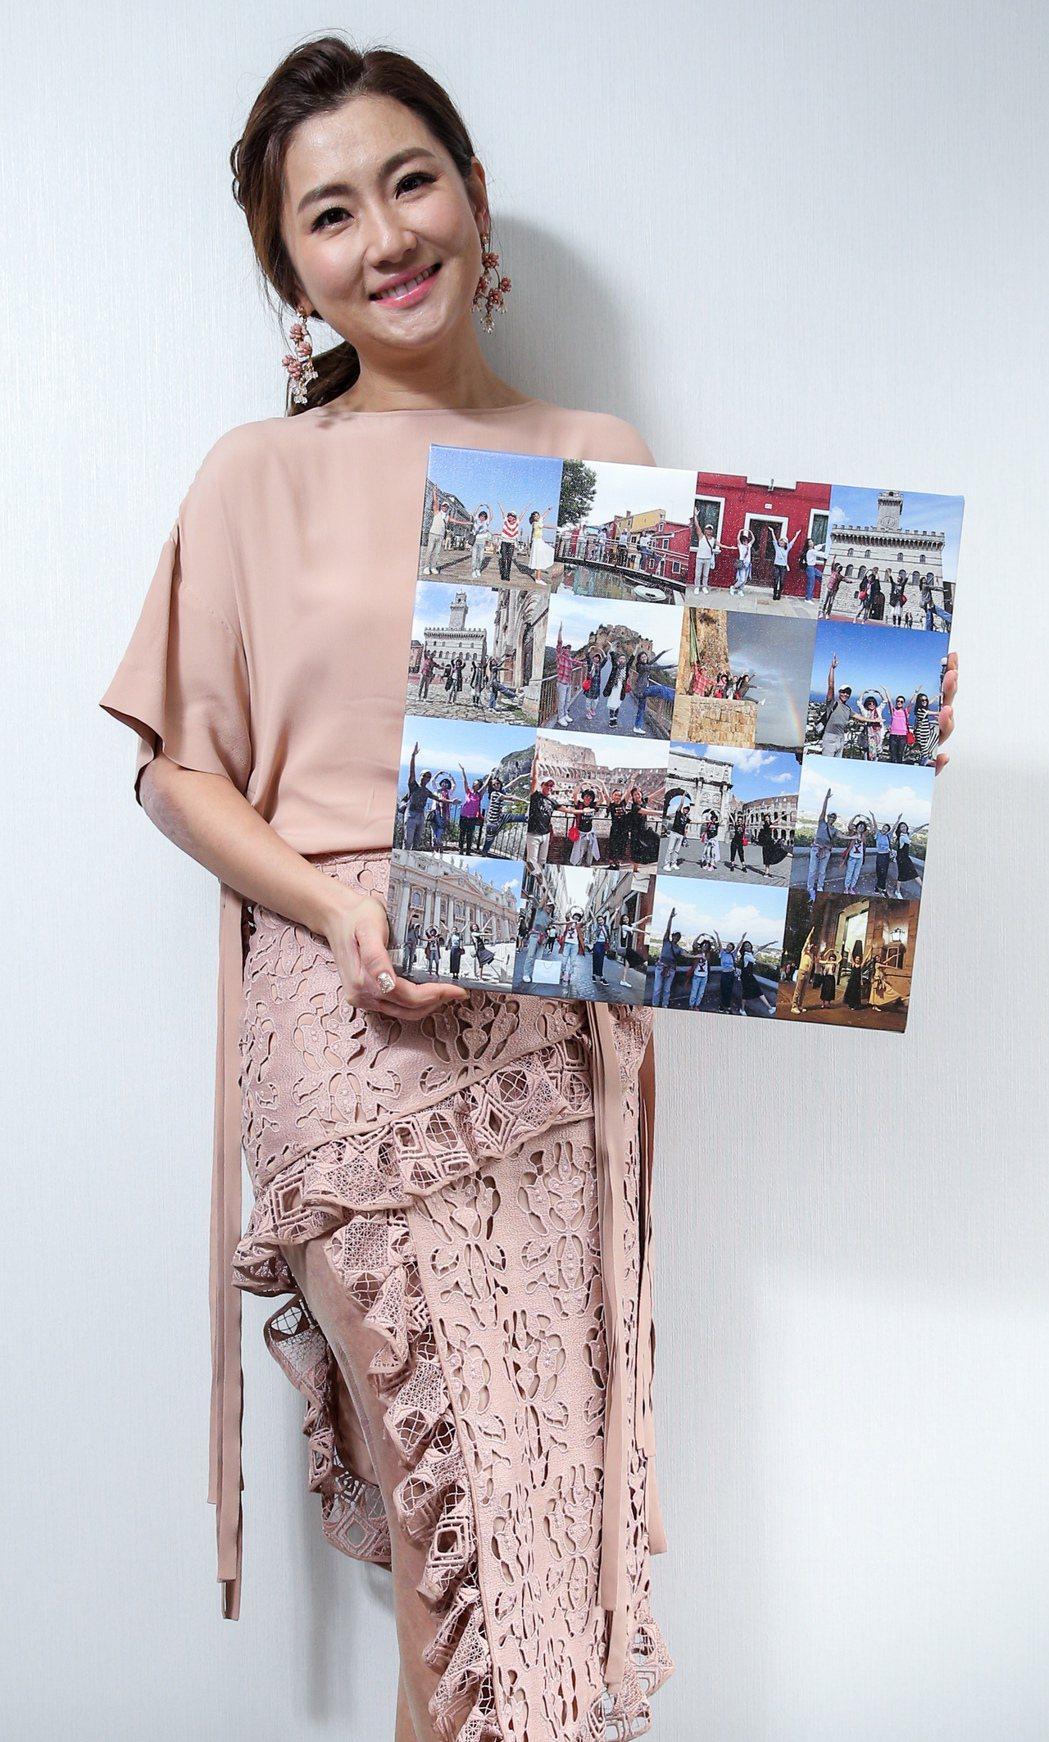 Selina將家人出遊照製成無框相簿,收藏回憶。記者程宜華/攝影